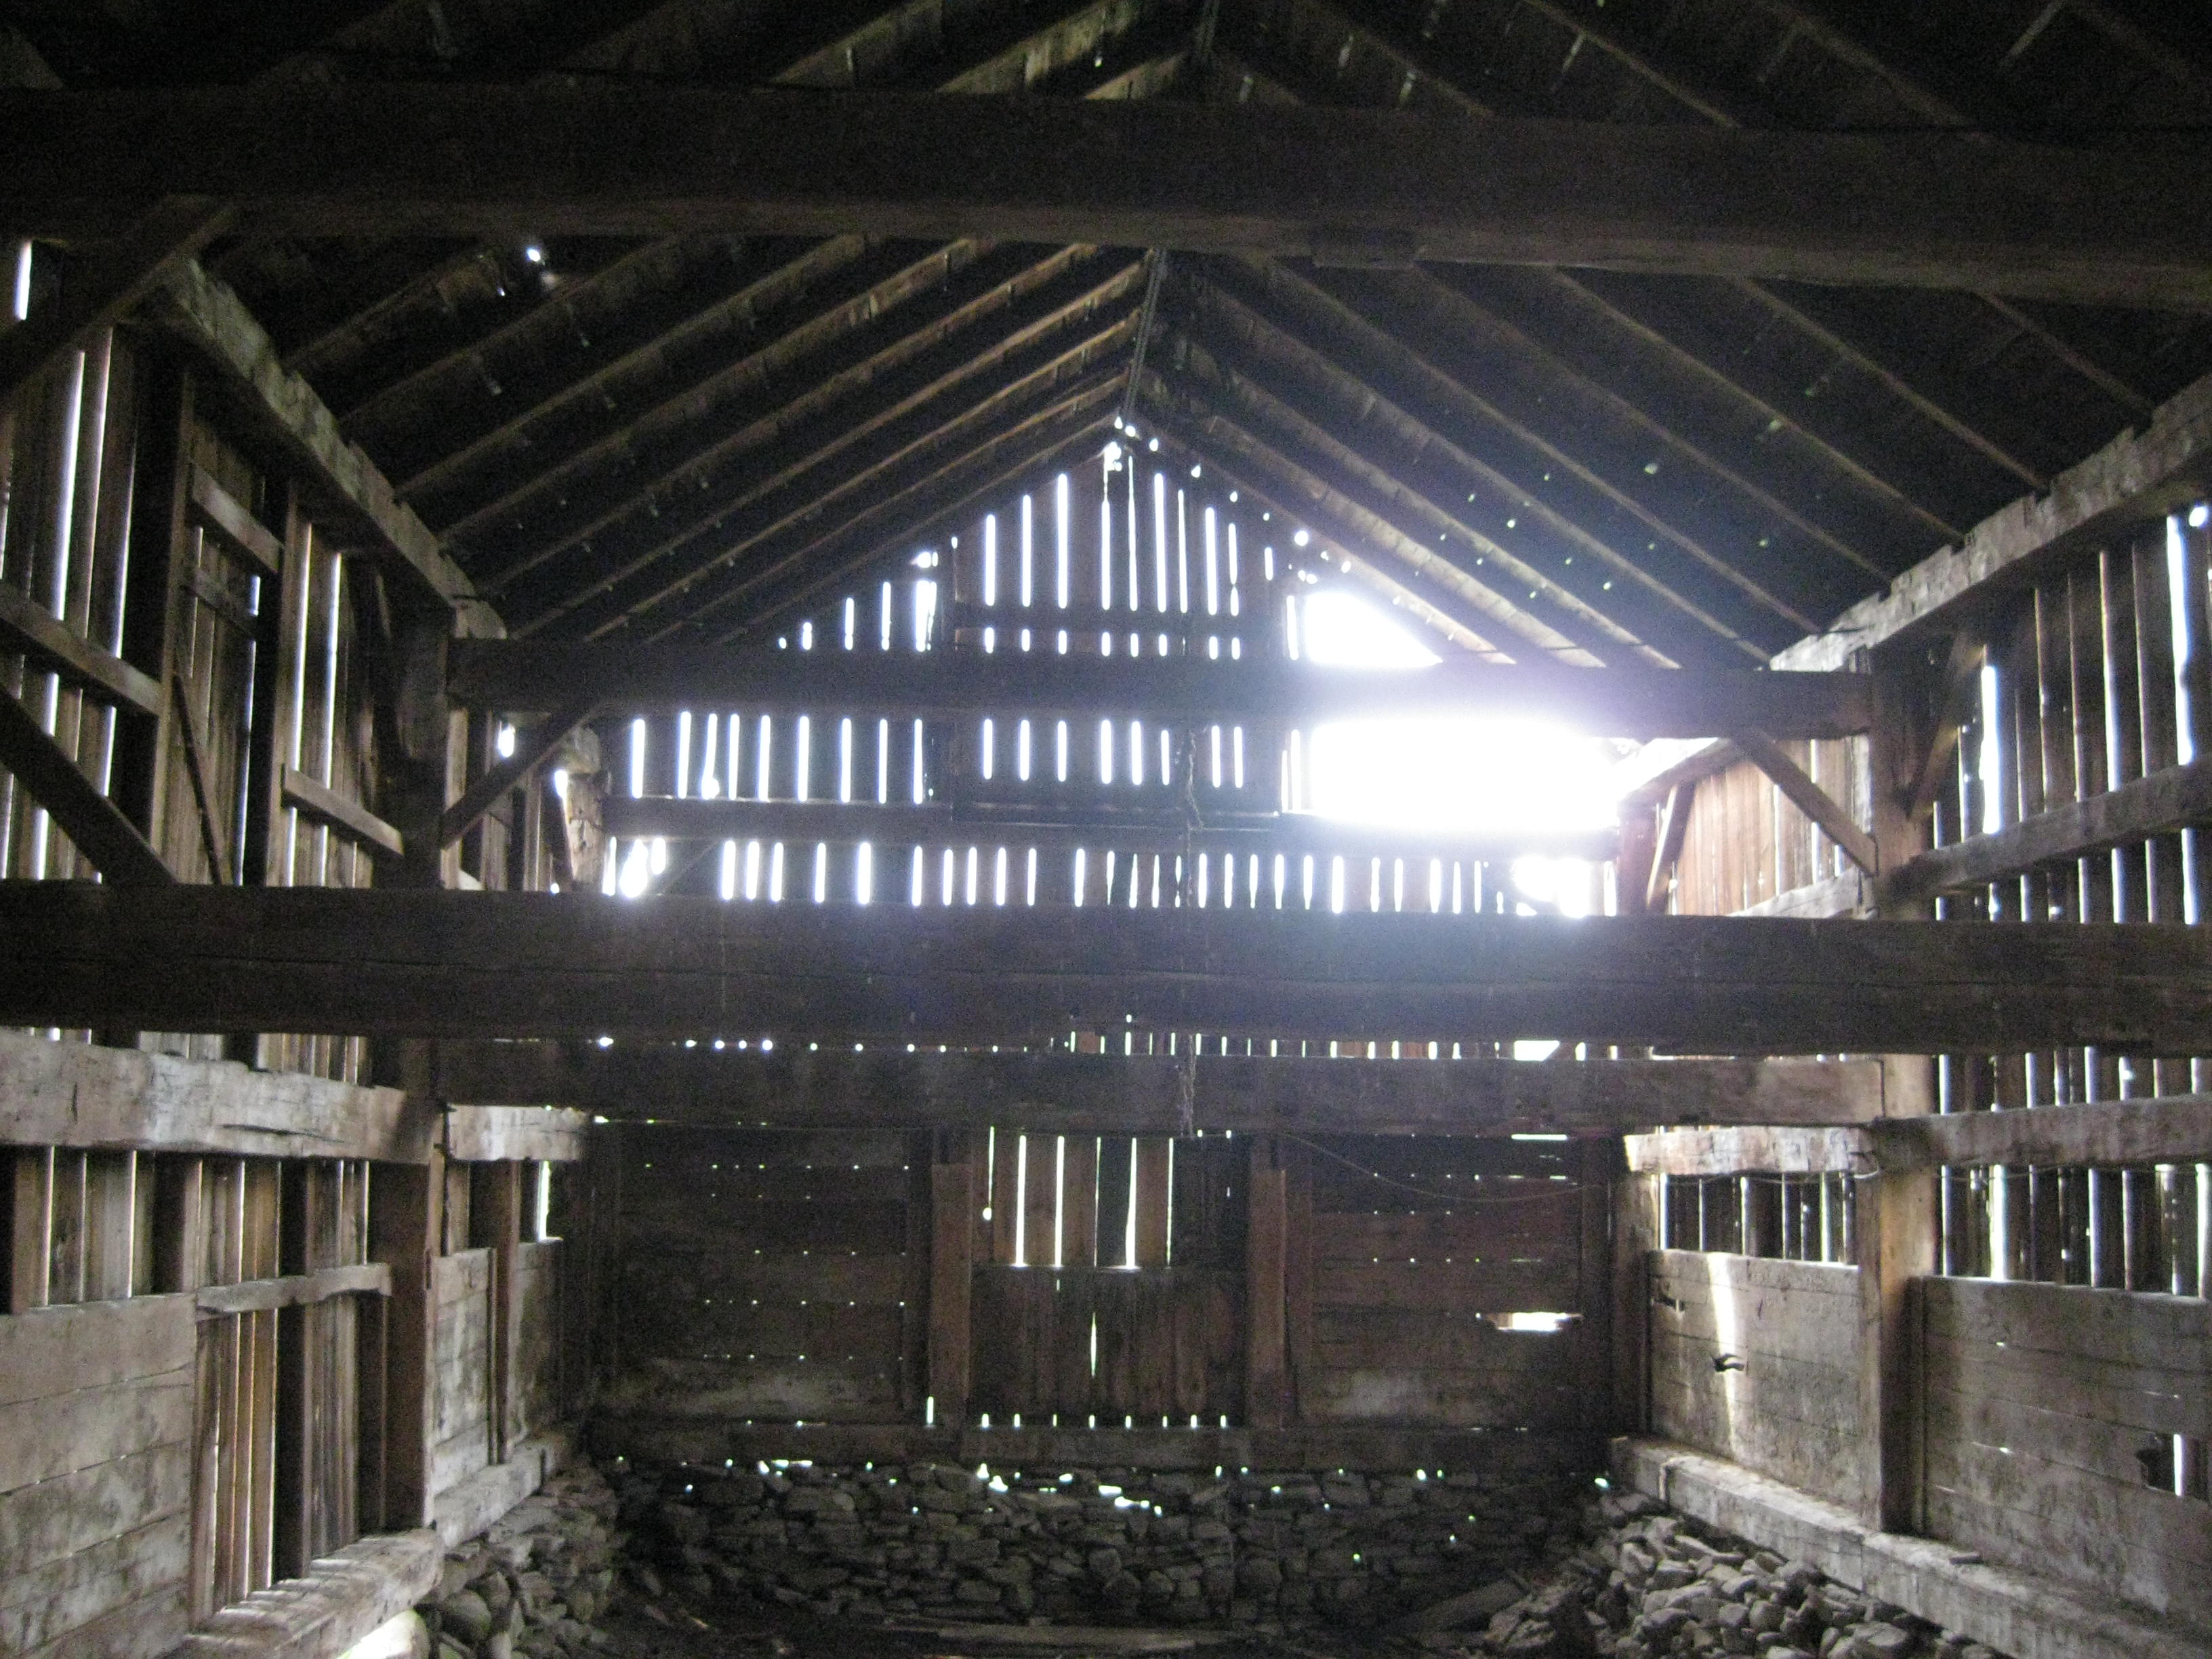 Inside The Cow Barn